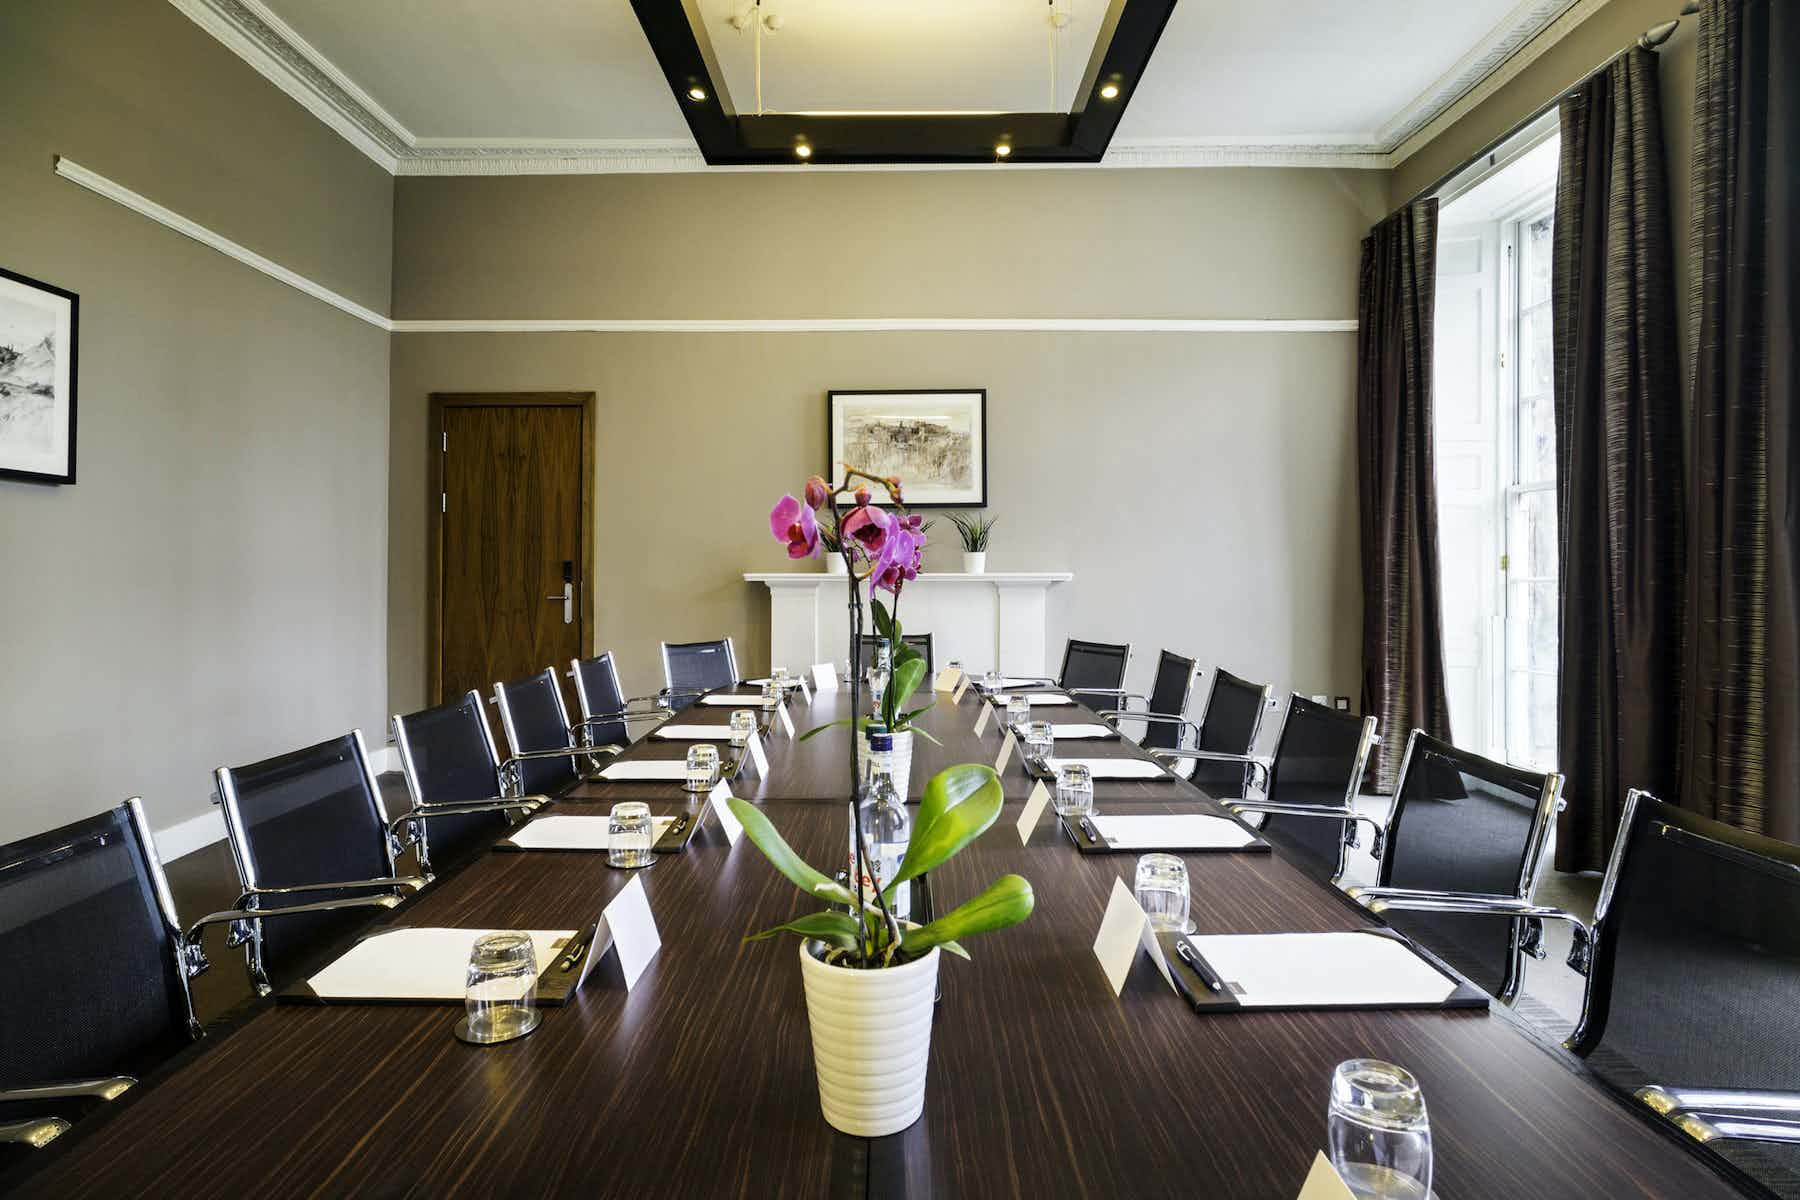 Regent, Apex Waterloo Place Hotel